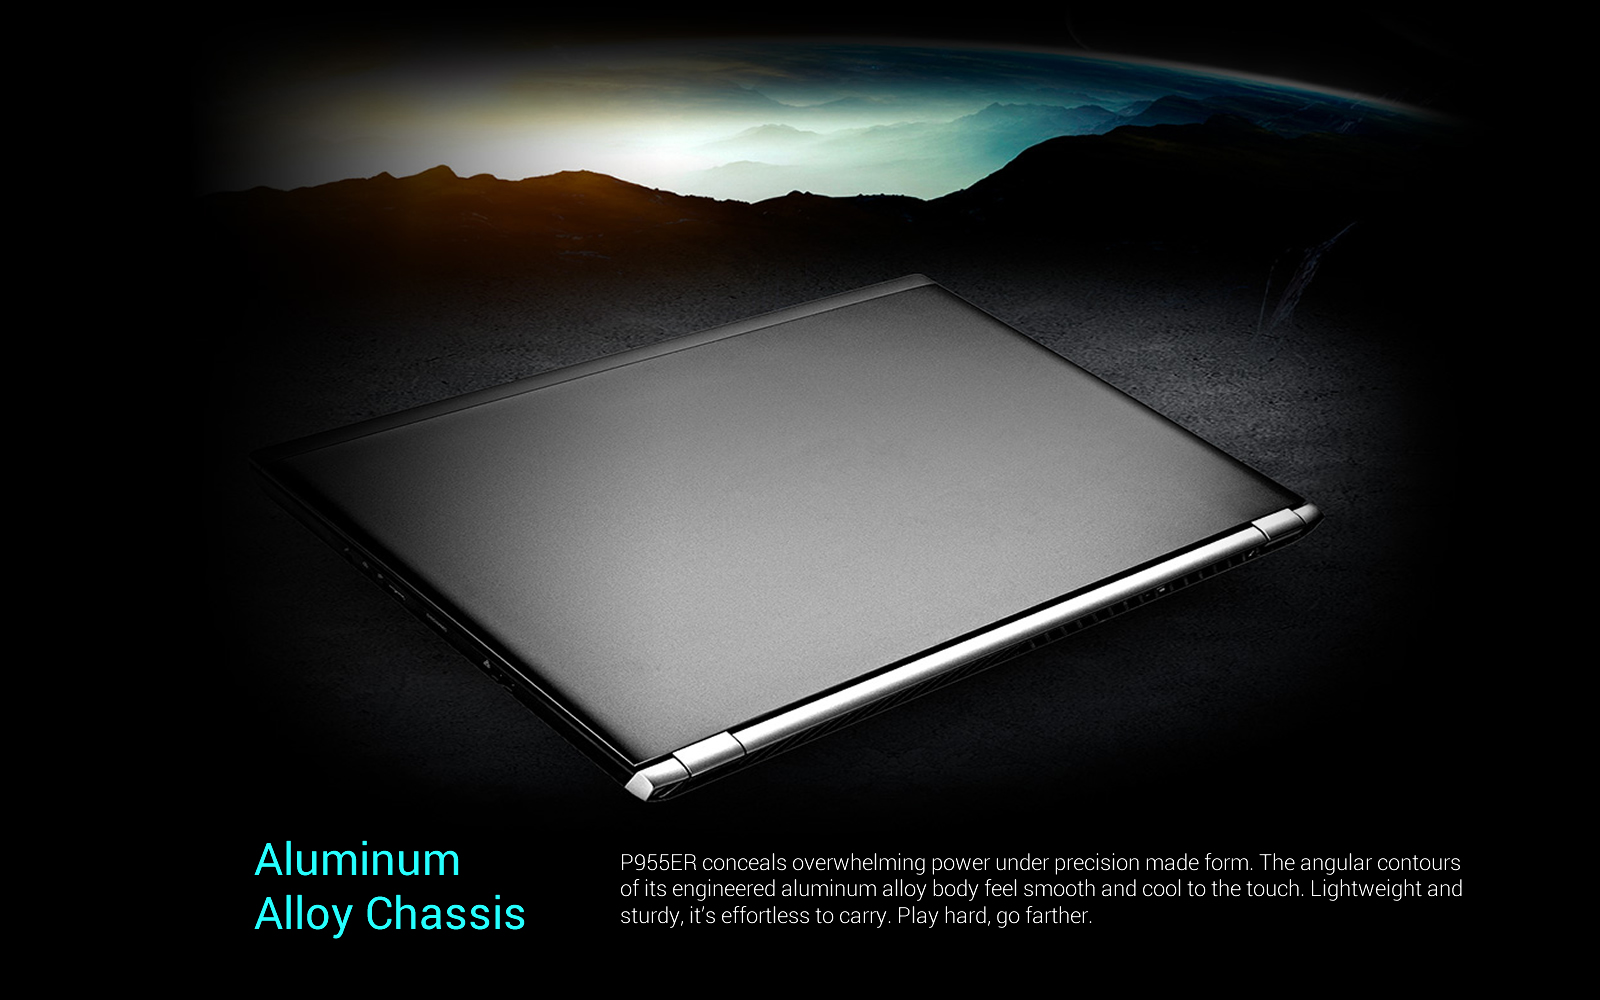 Clevo P955er 156 Core I7 Gtx 1070 Gaming Laptop Avadirect Asus Mg279q Monitor 27ampquot 2k Wqhd 2560 X 1440 Ips Up To 144hz Freesync Cpu